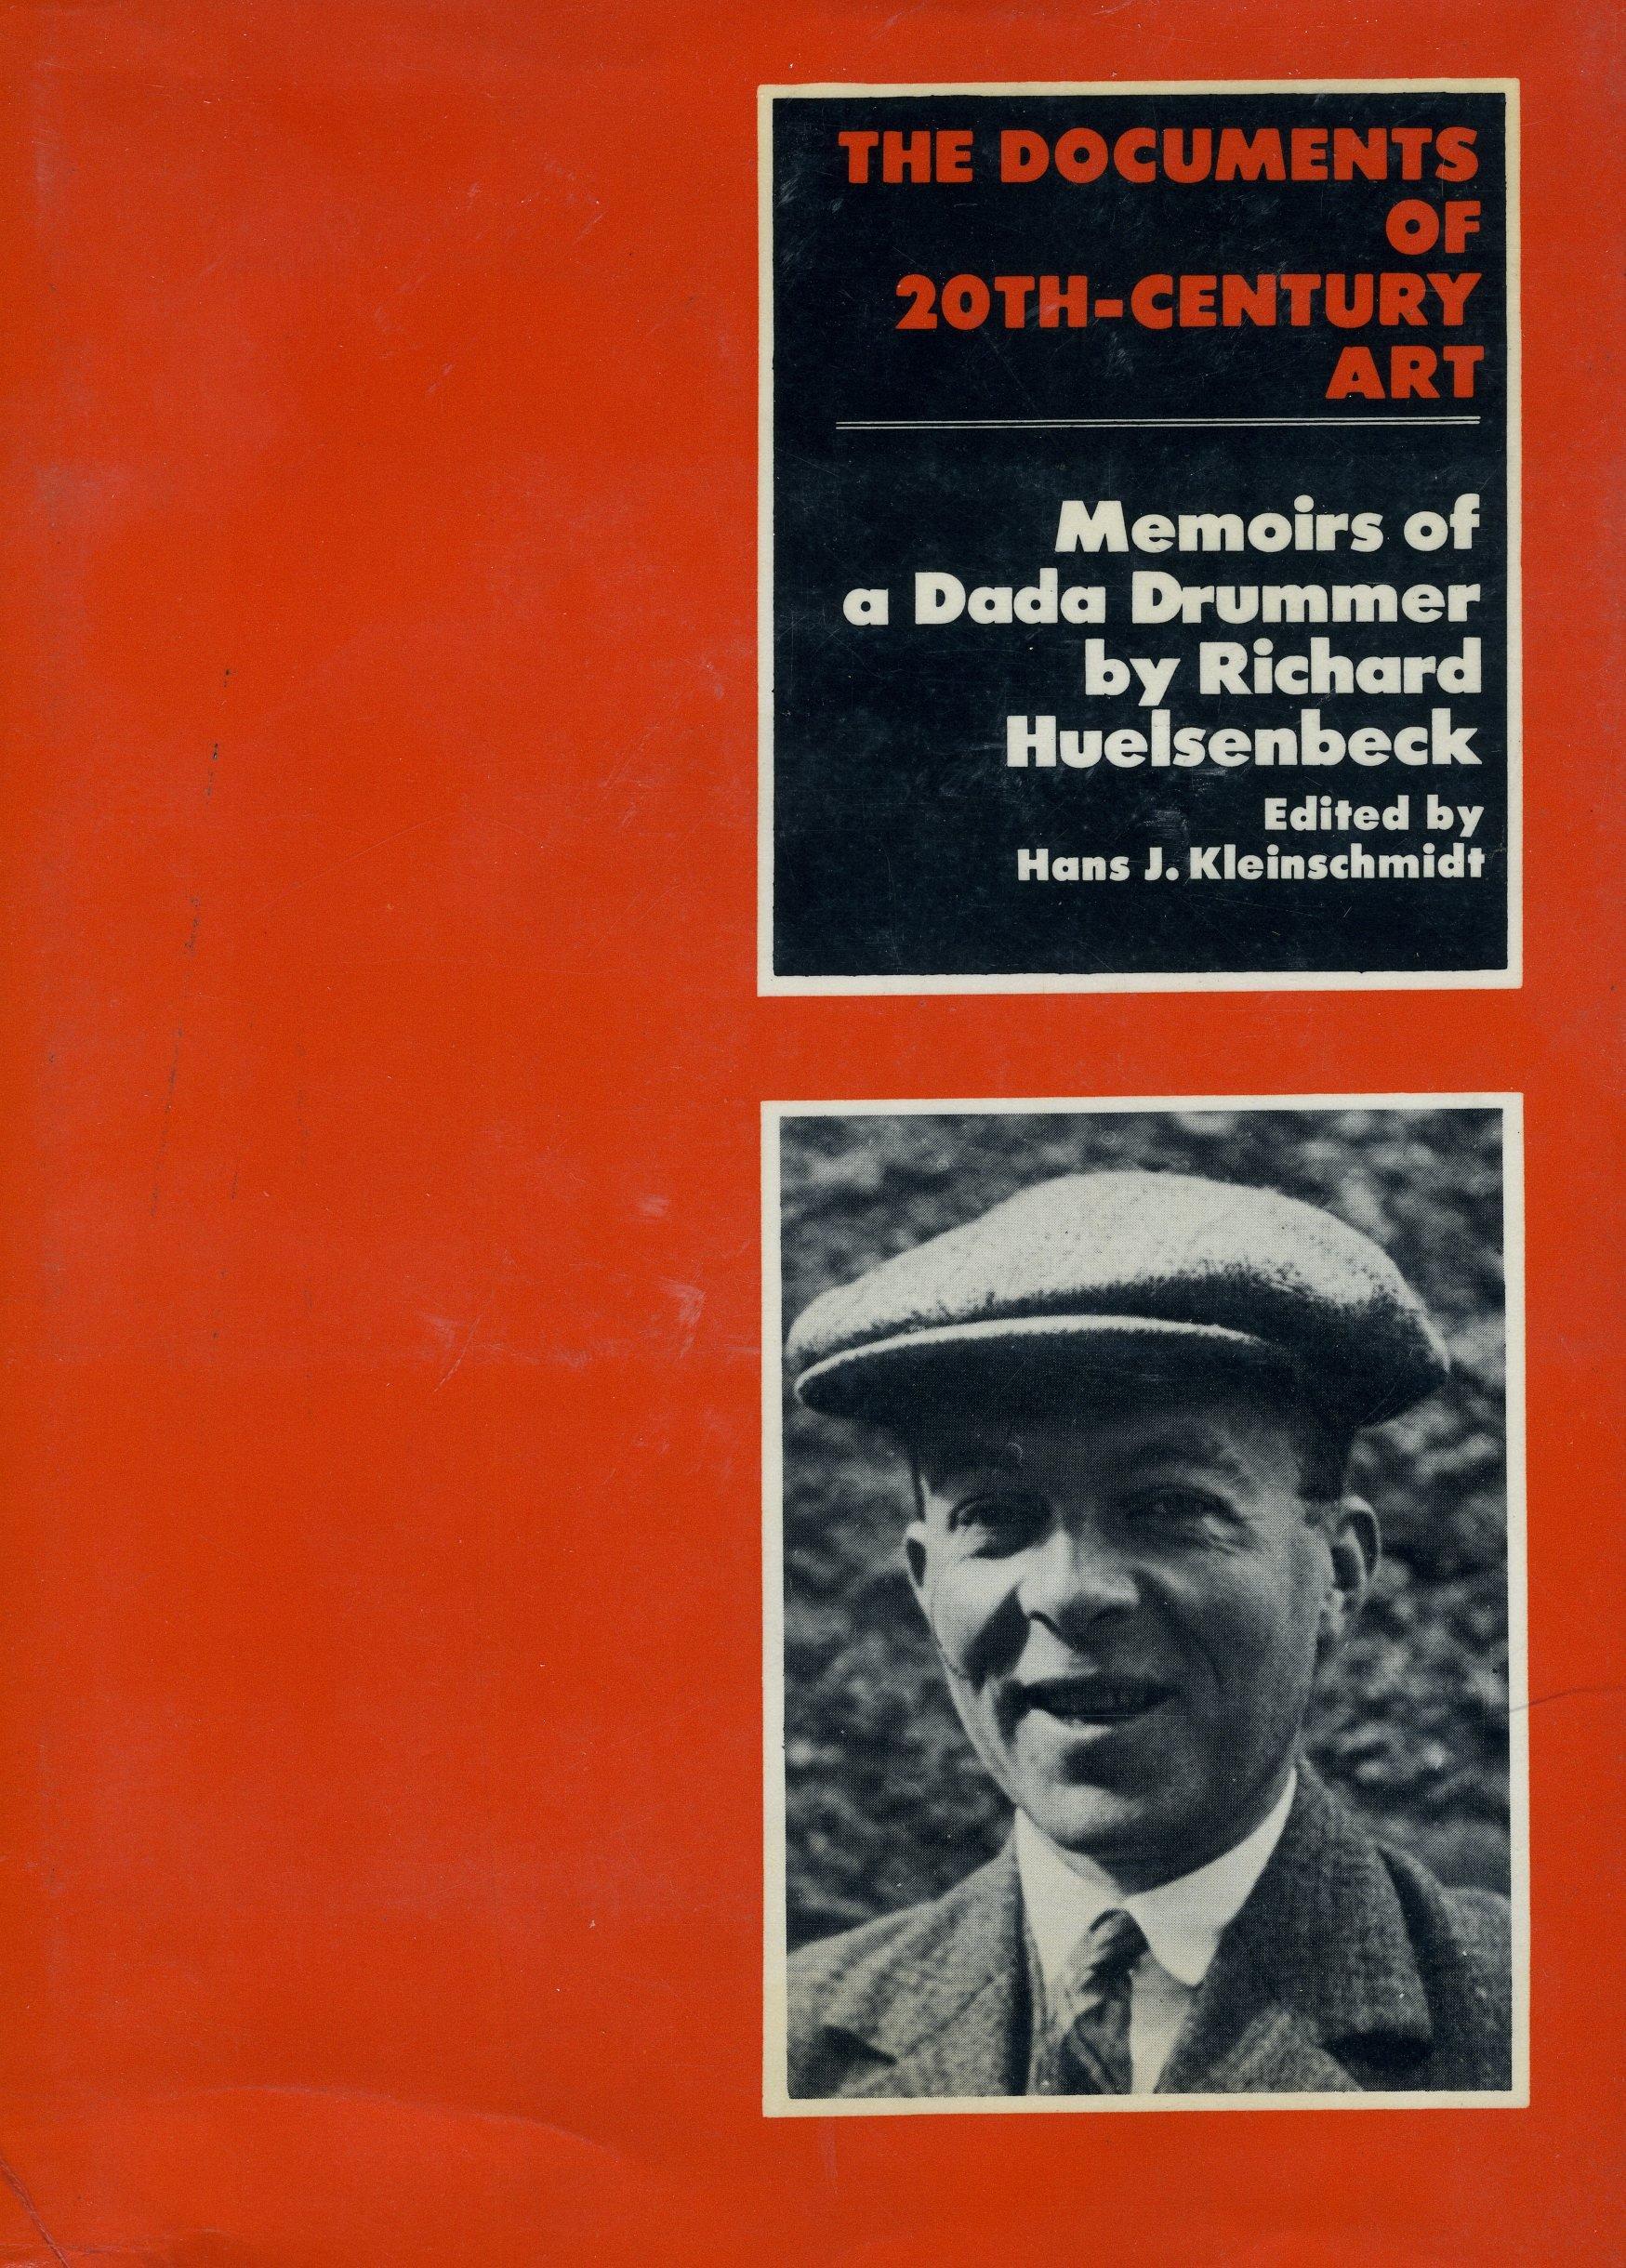 Slikovni rezultat za Richard Huelsenbeck, Memoirs of a Dada Drummer